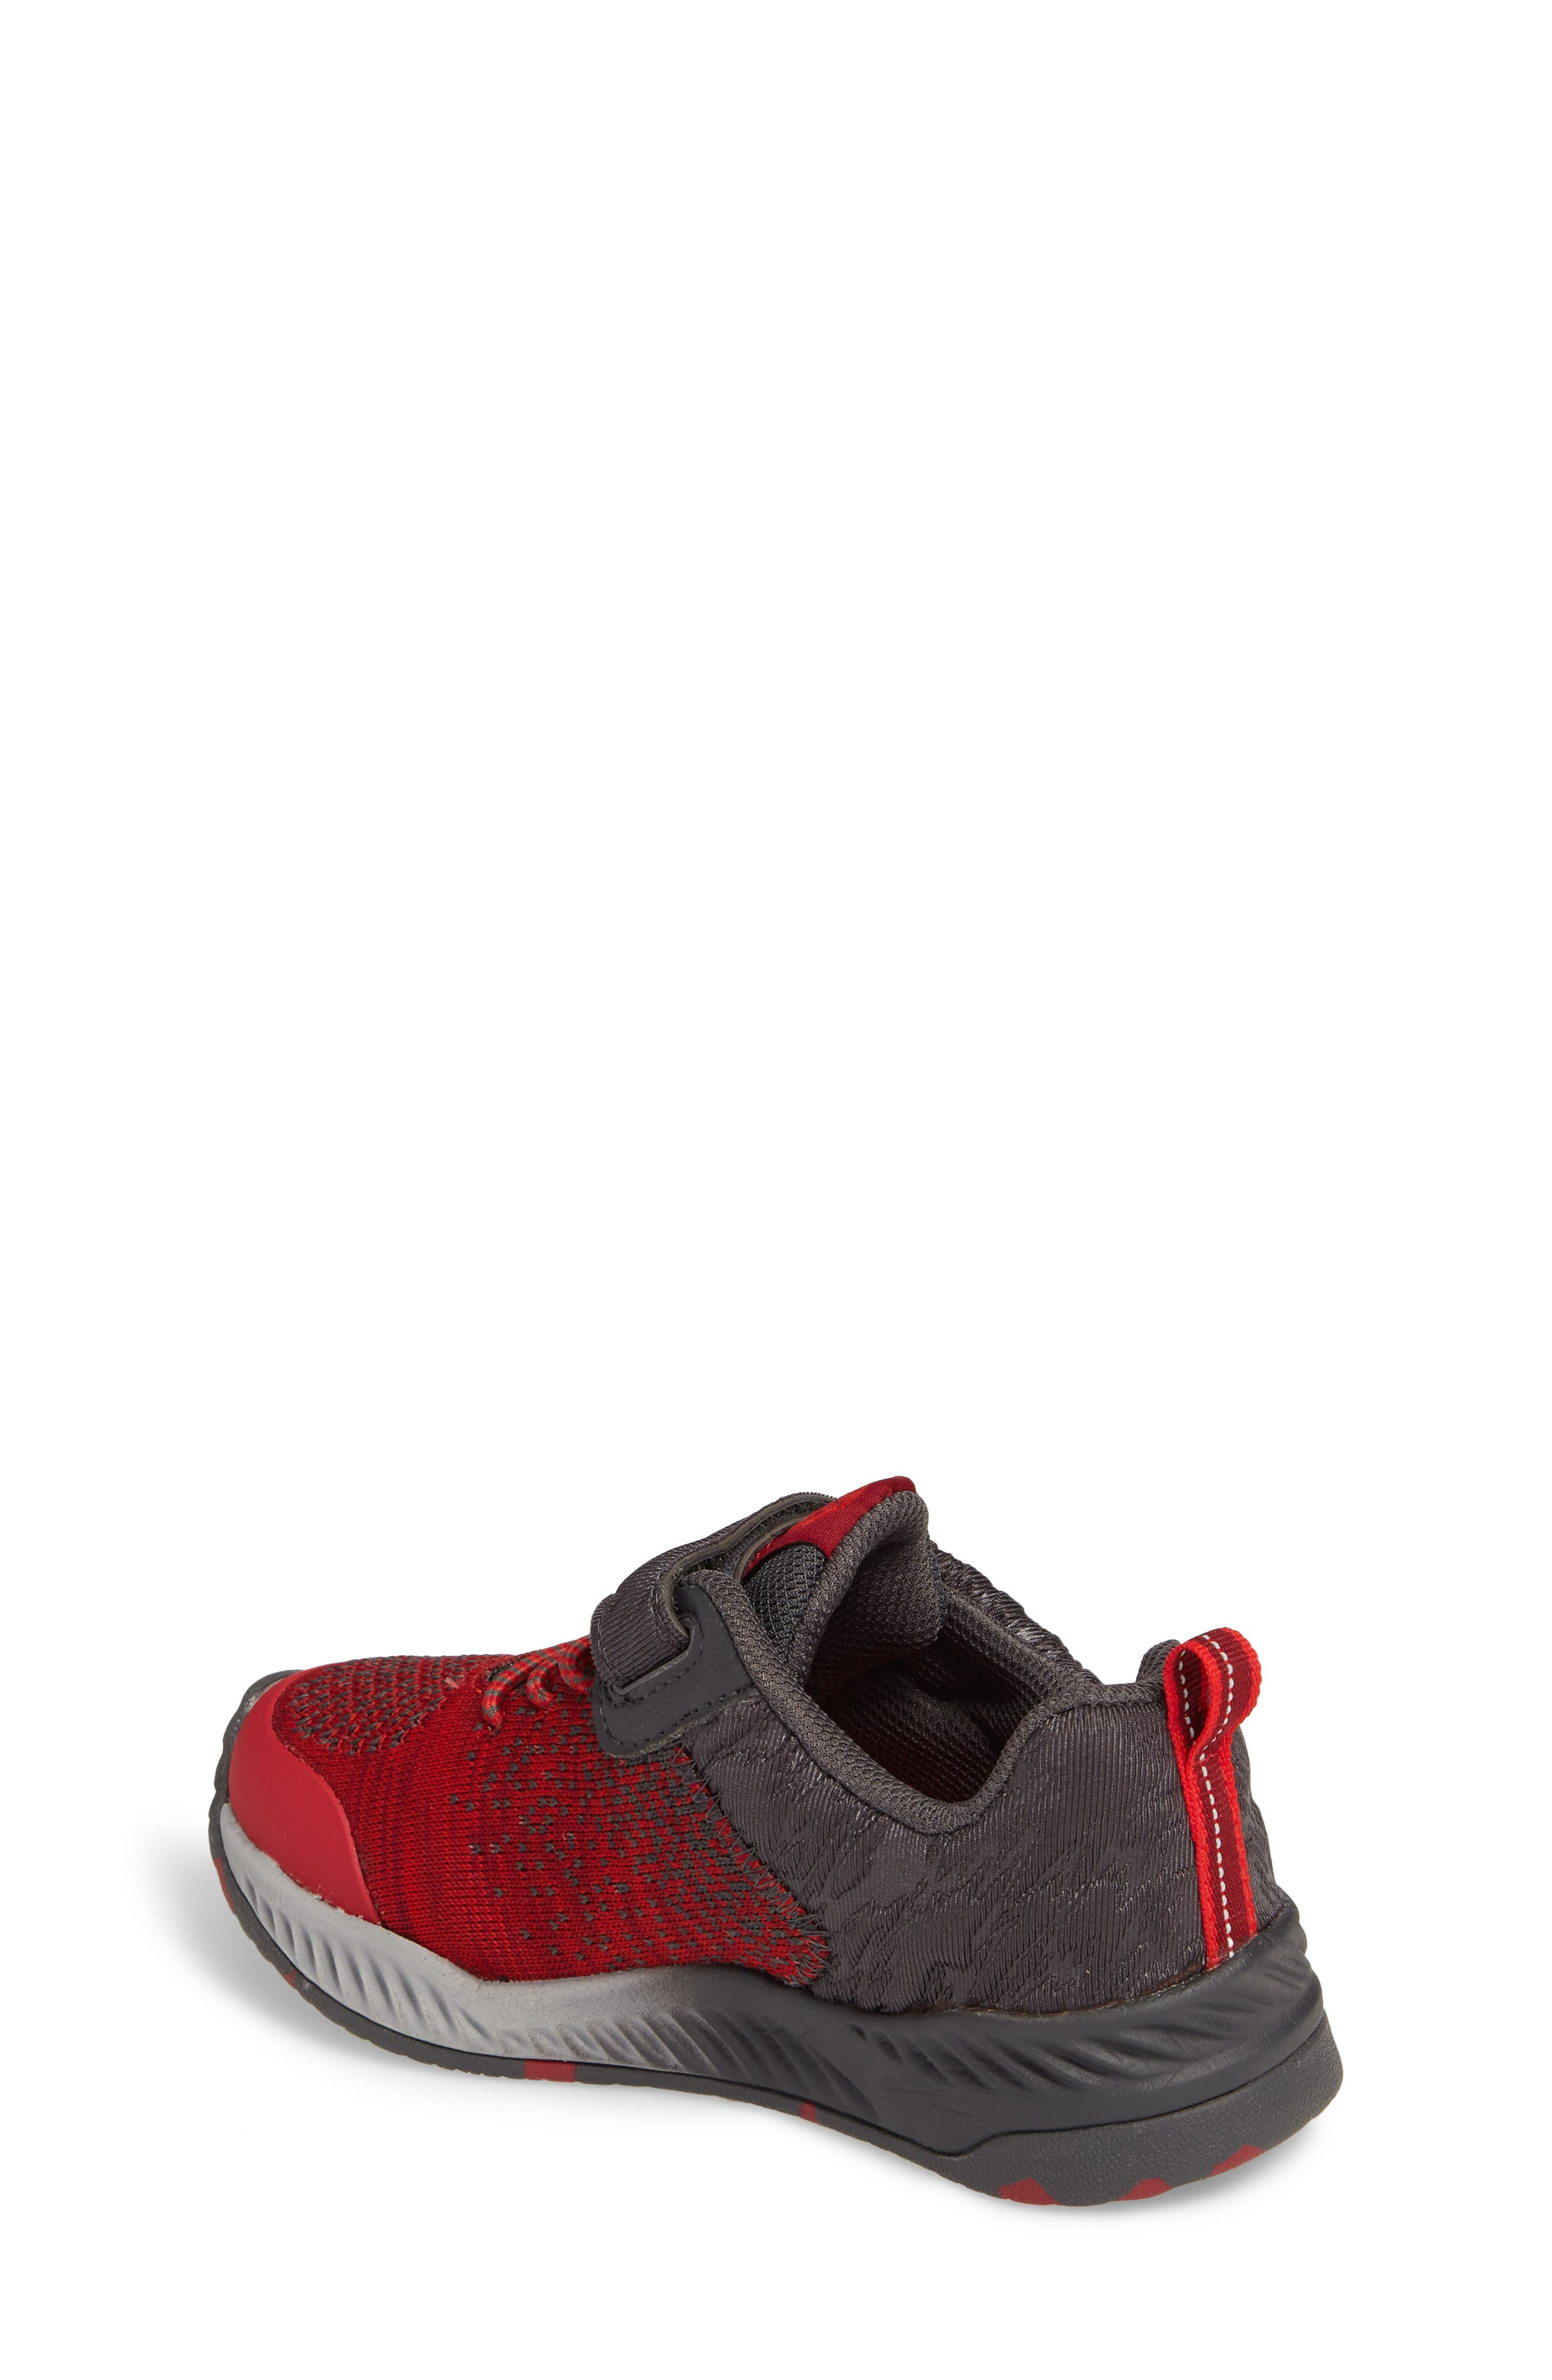 Alternate Image 2  - Jambu Talon Knit Sneaker (Toddler, Little Kid & Big Kid)